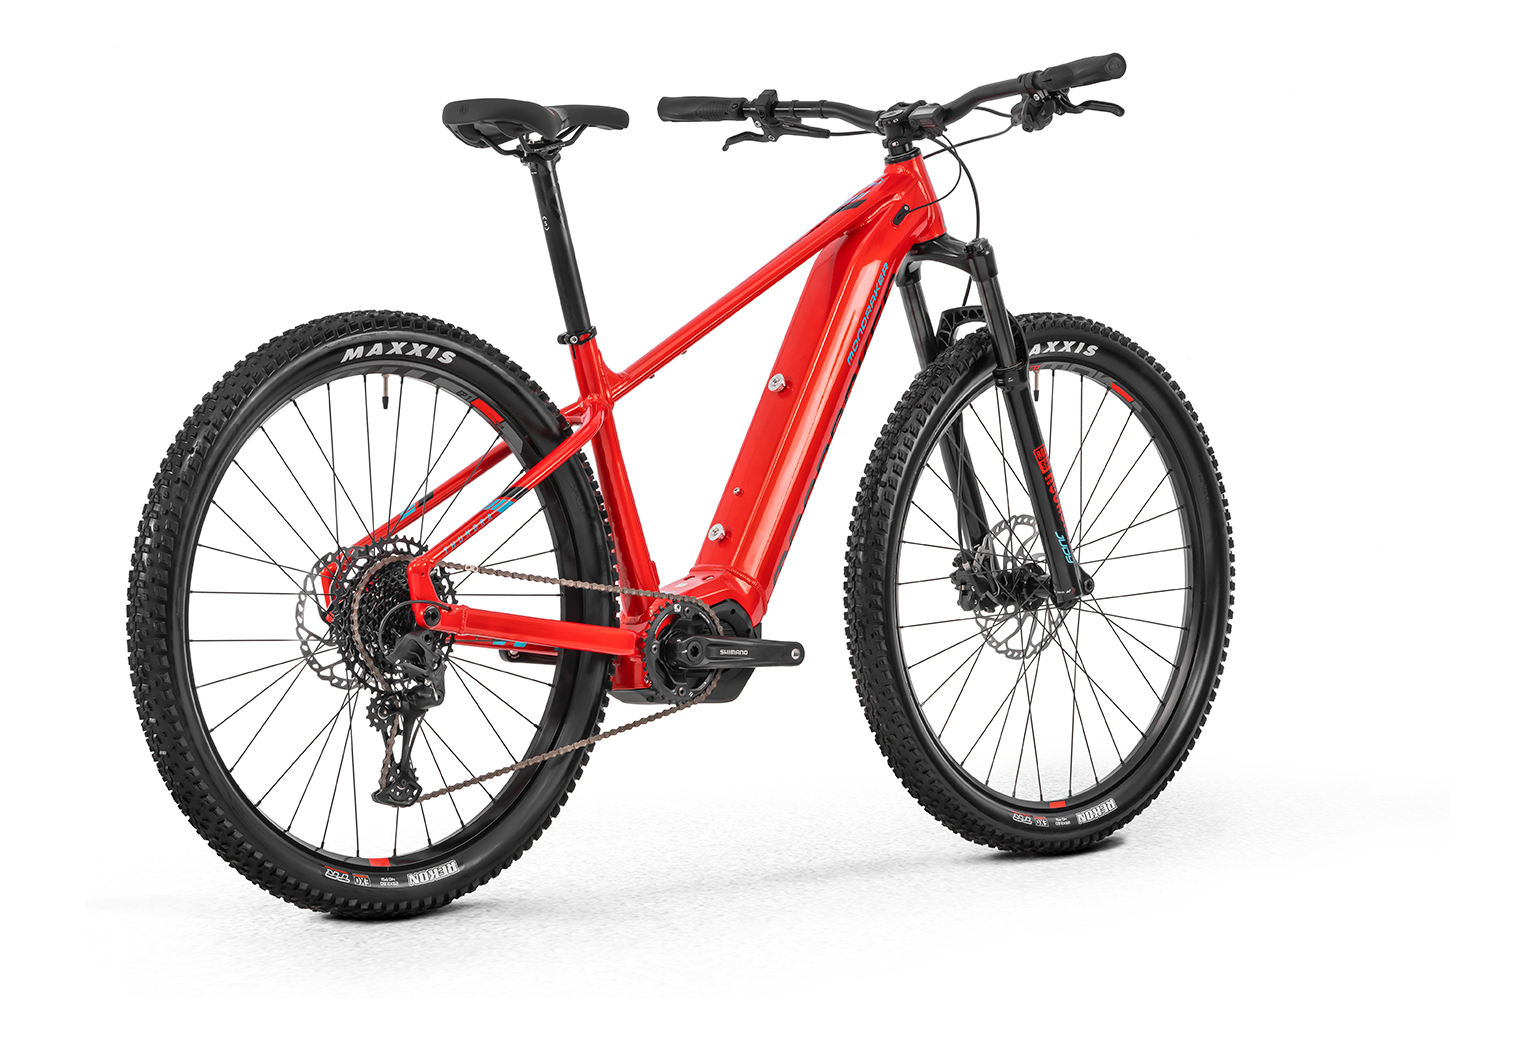 Cube Mtb Mountain Vélo Cycle Pneu Tube Intérieur